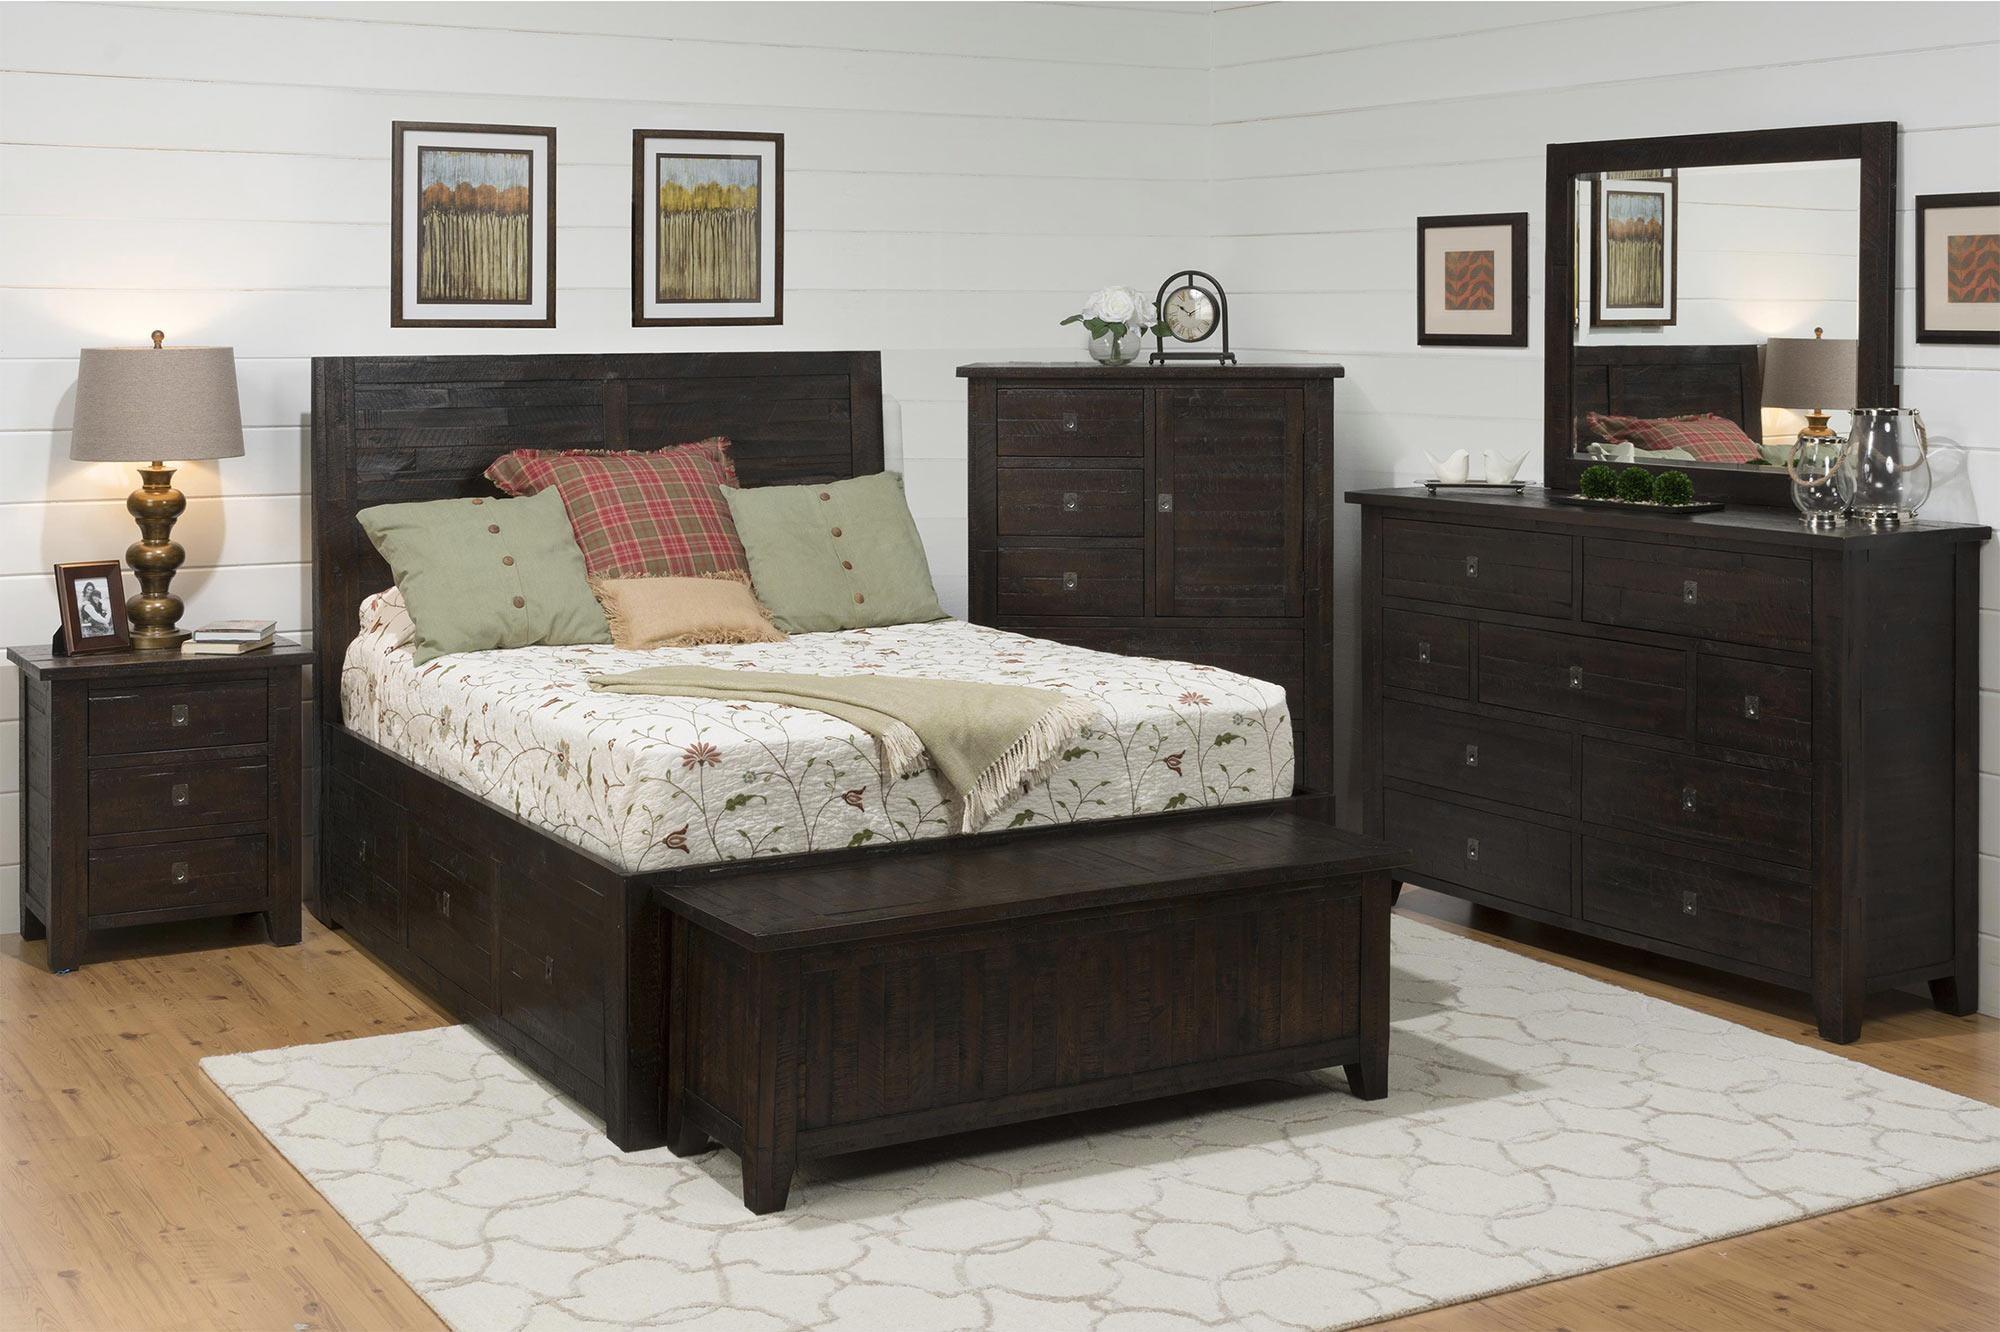 4-Piece King Storage Bedroom Set